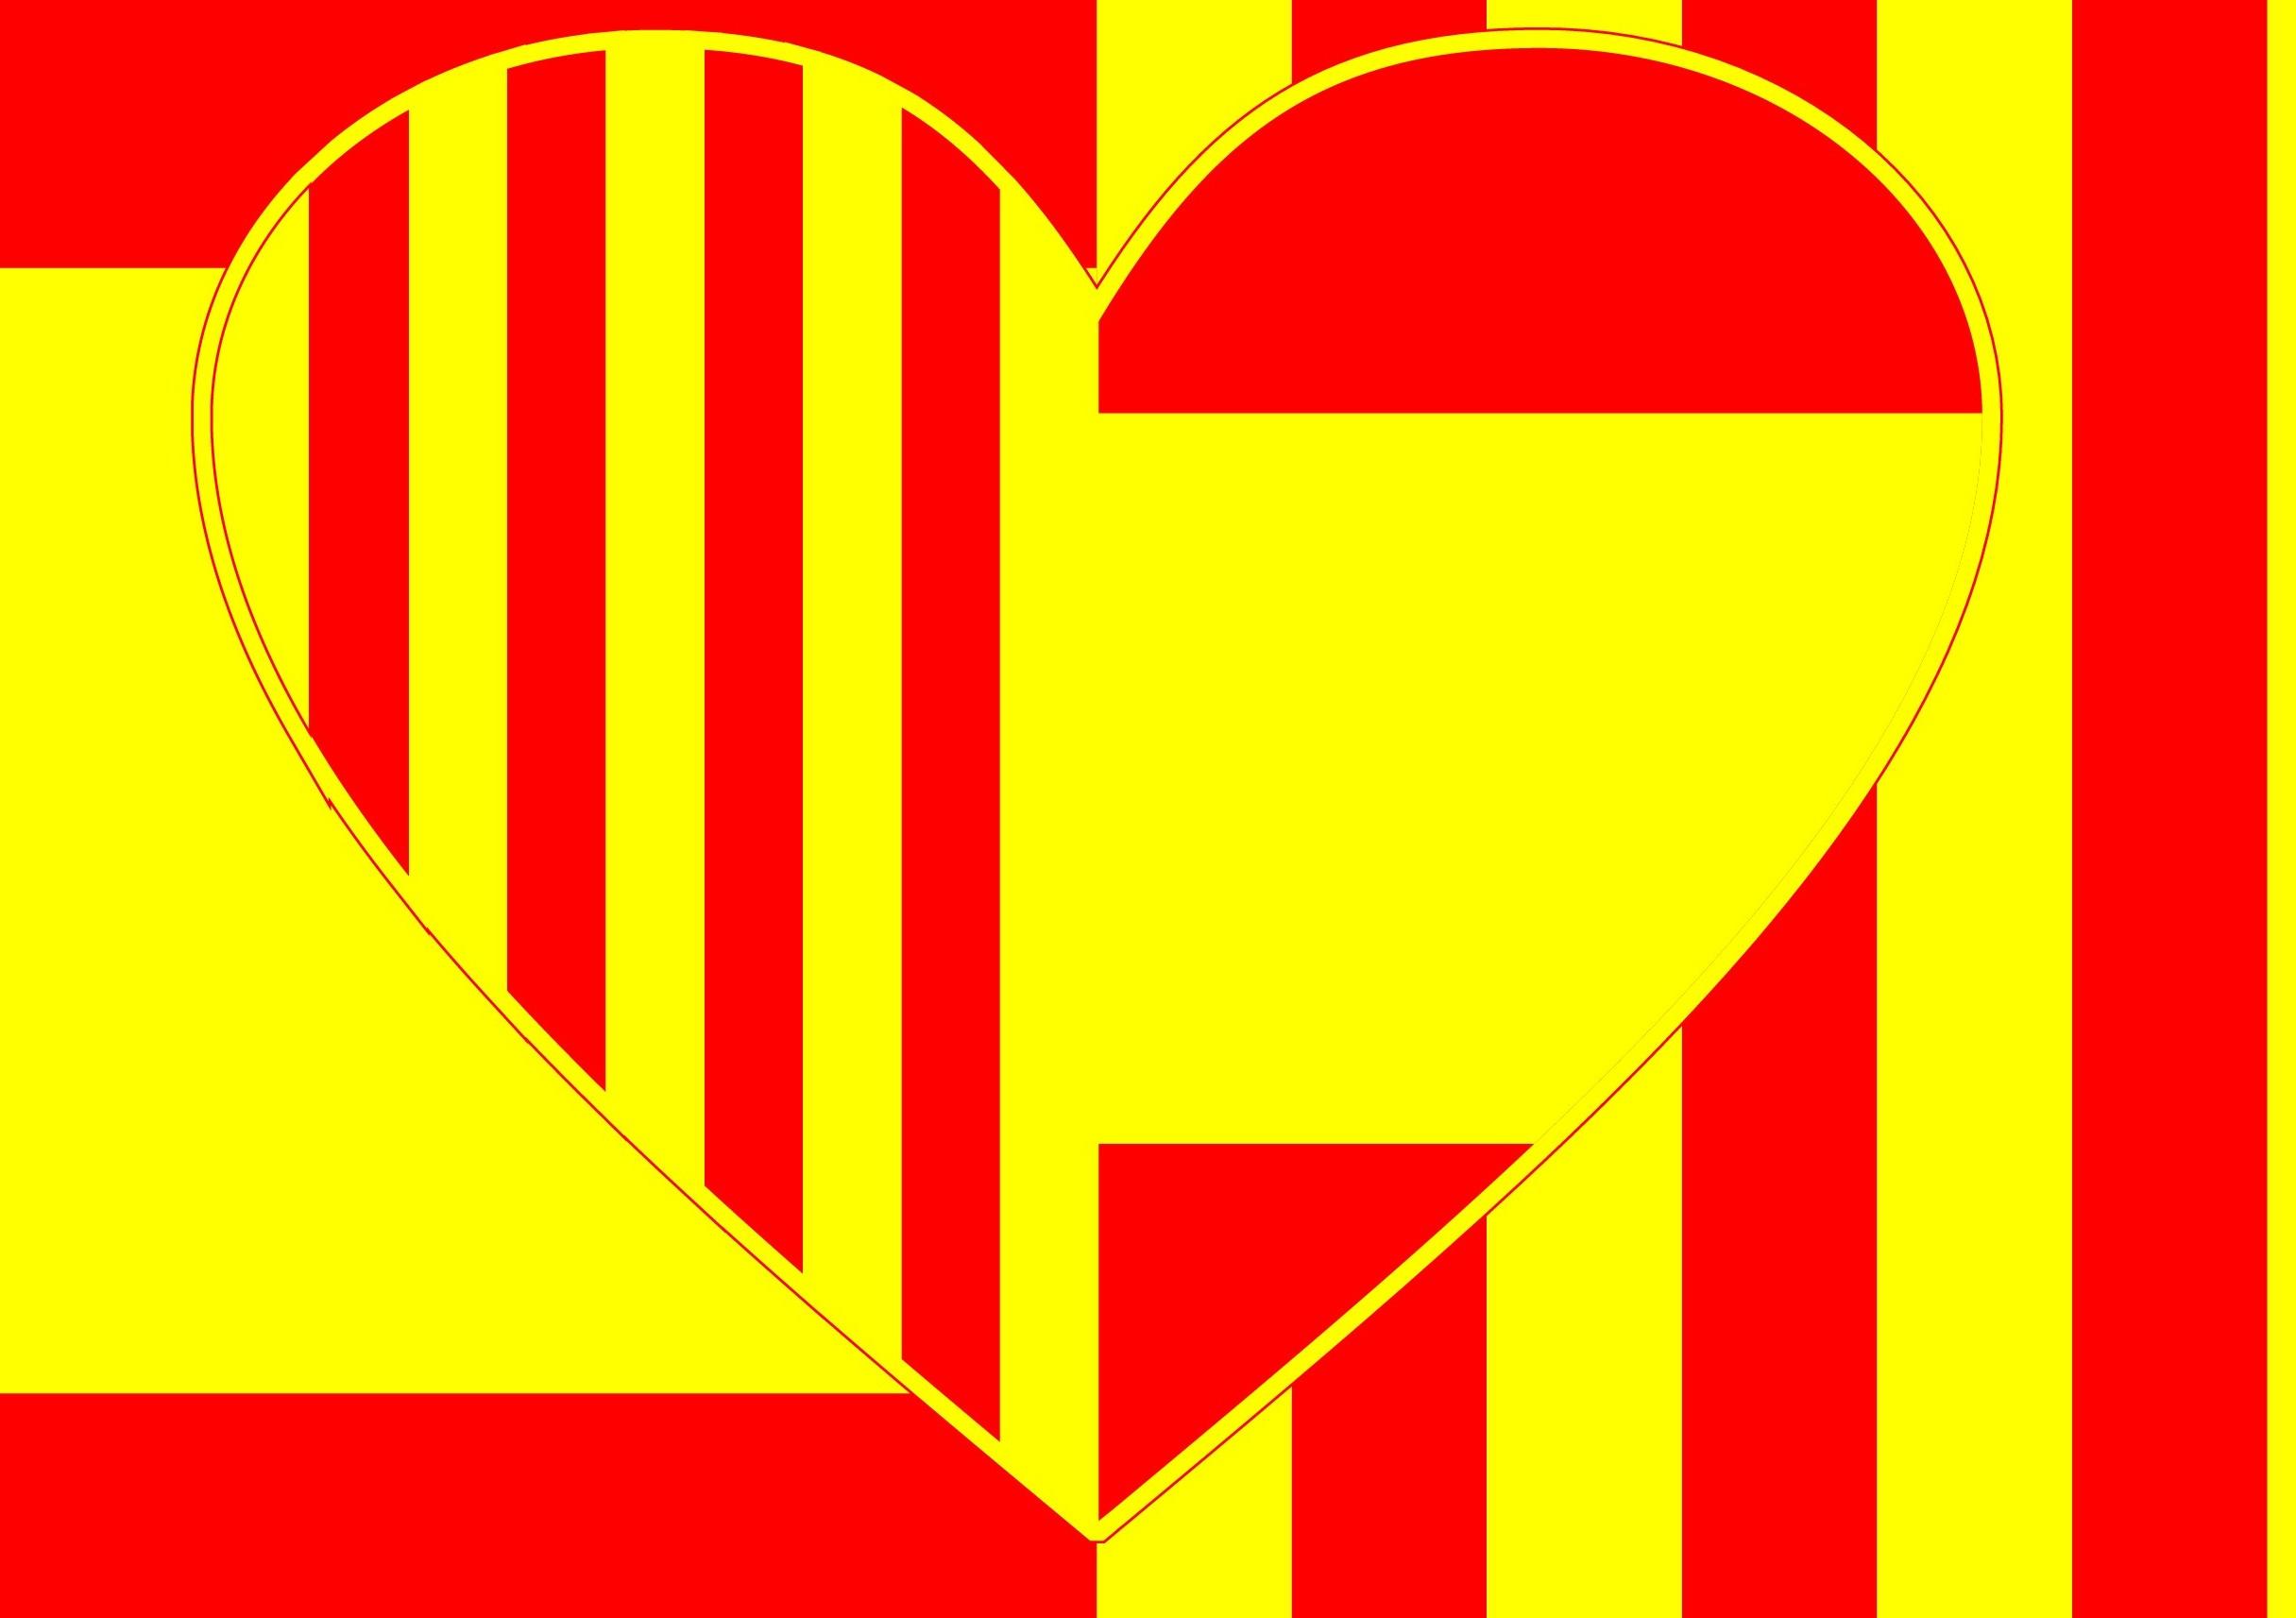 bandera_corazon_espa_a_catalu_a_100x150_copyright